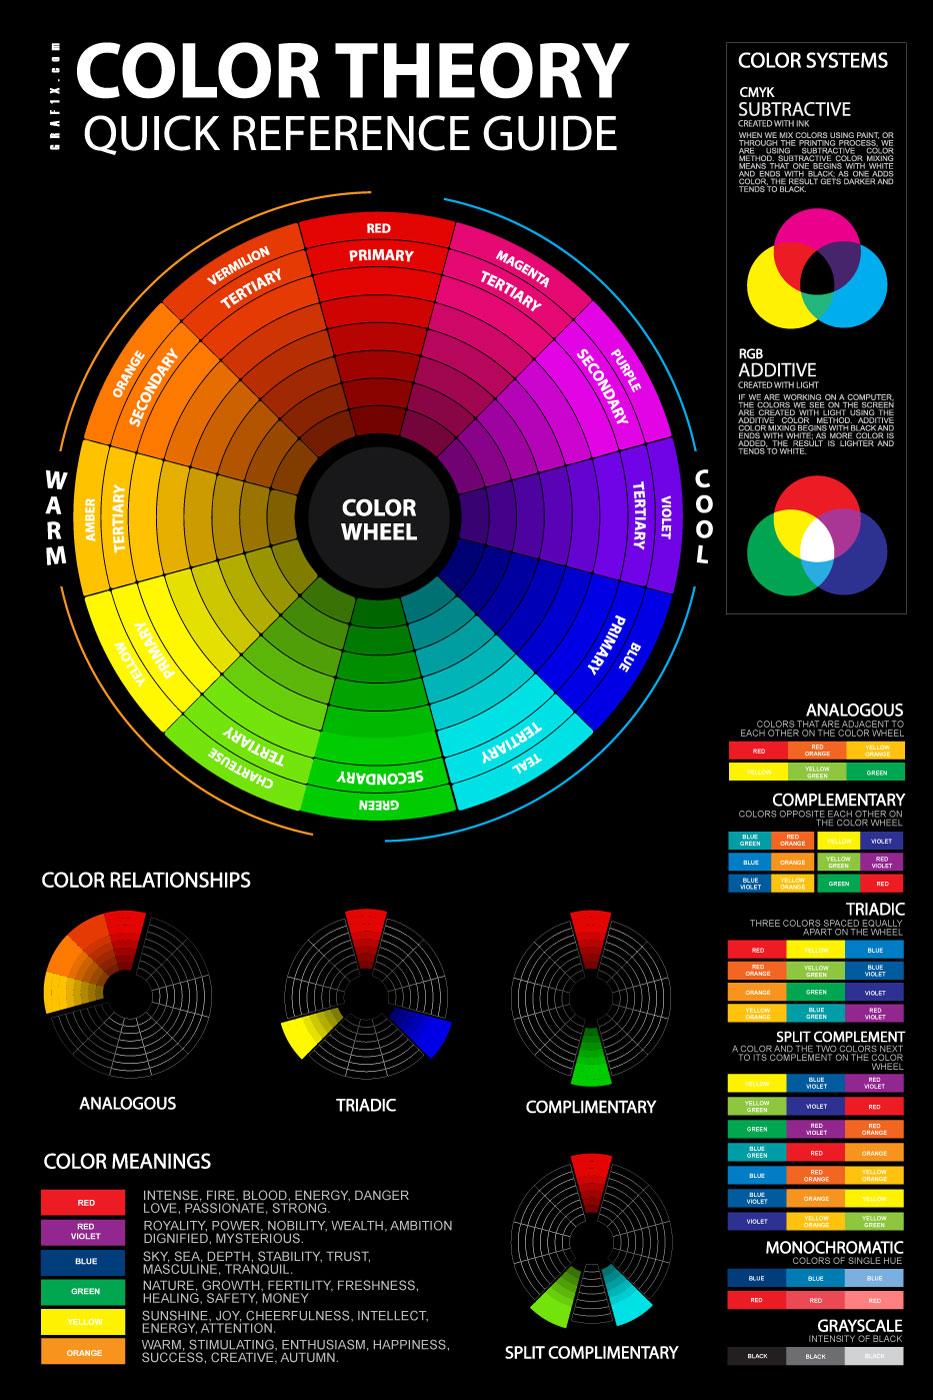 color theory chart basics for artists - اصول طراحی کارت ویزیت - چهار فصل کاربردی برای طراحی اصولی کارت ویزیت